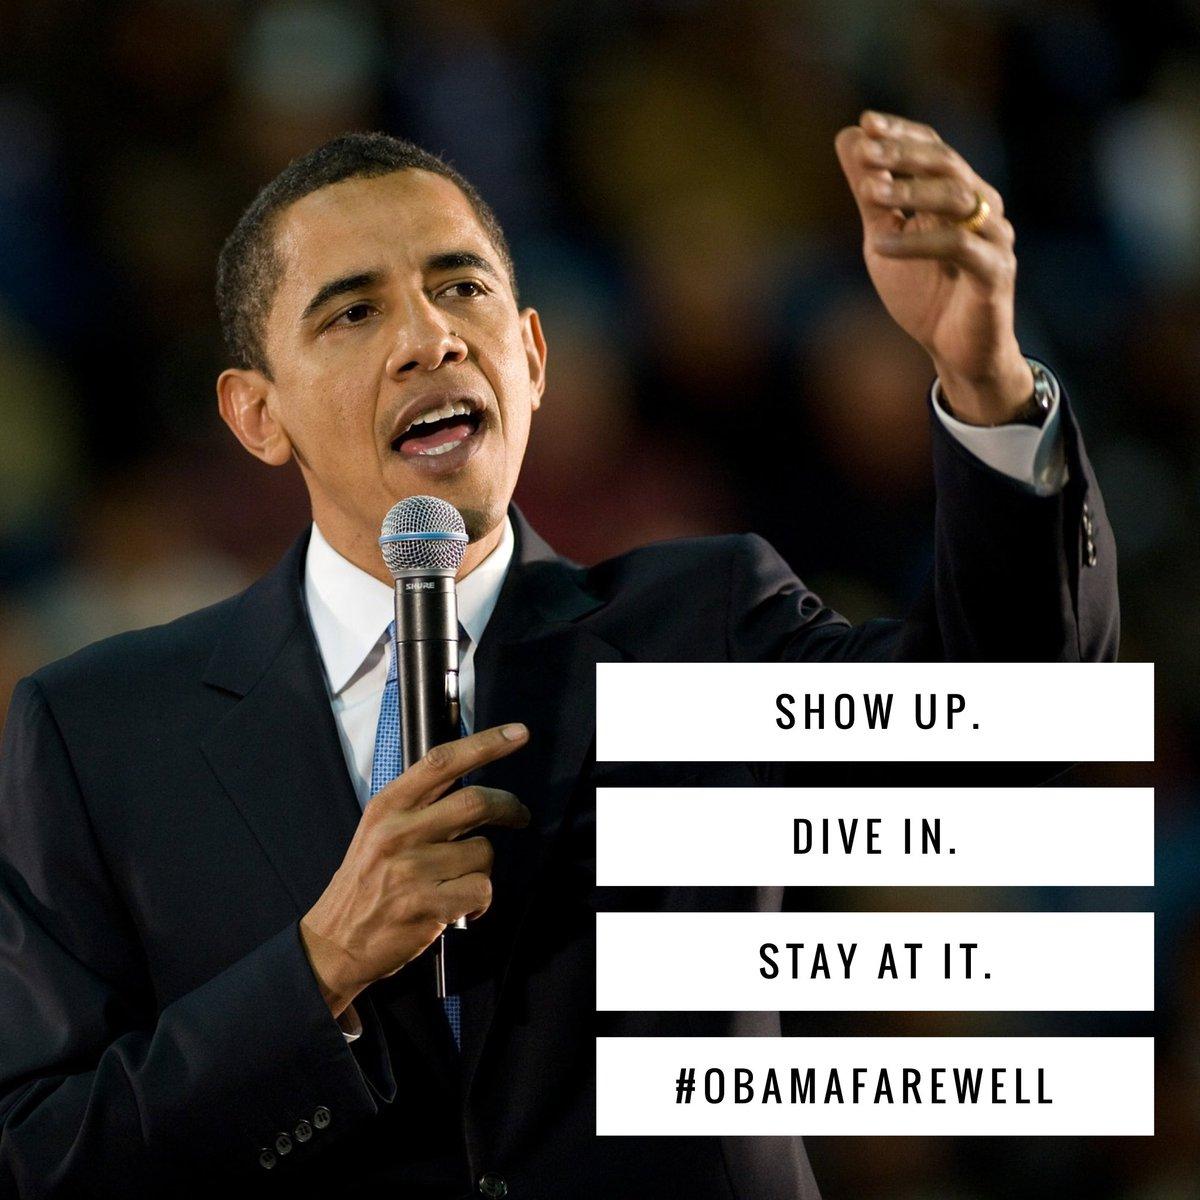 Show up. Dive in. Stay at it.                      #ObamaFarewell #ObamaFarewellAddress @WordSwagApp https://t.co/5ErAD9UnnM